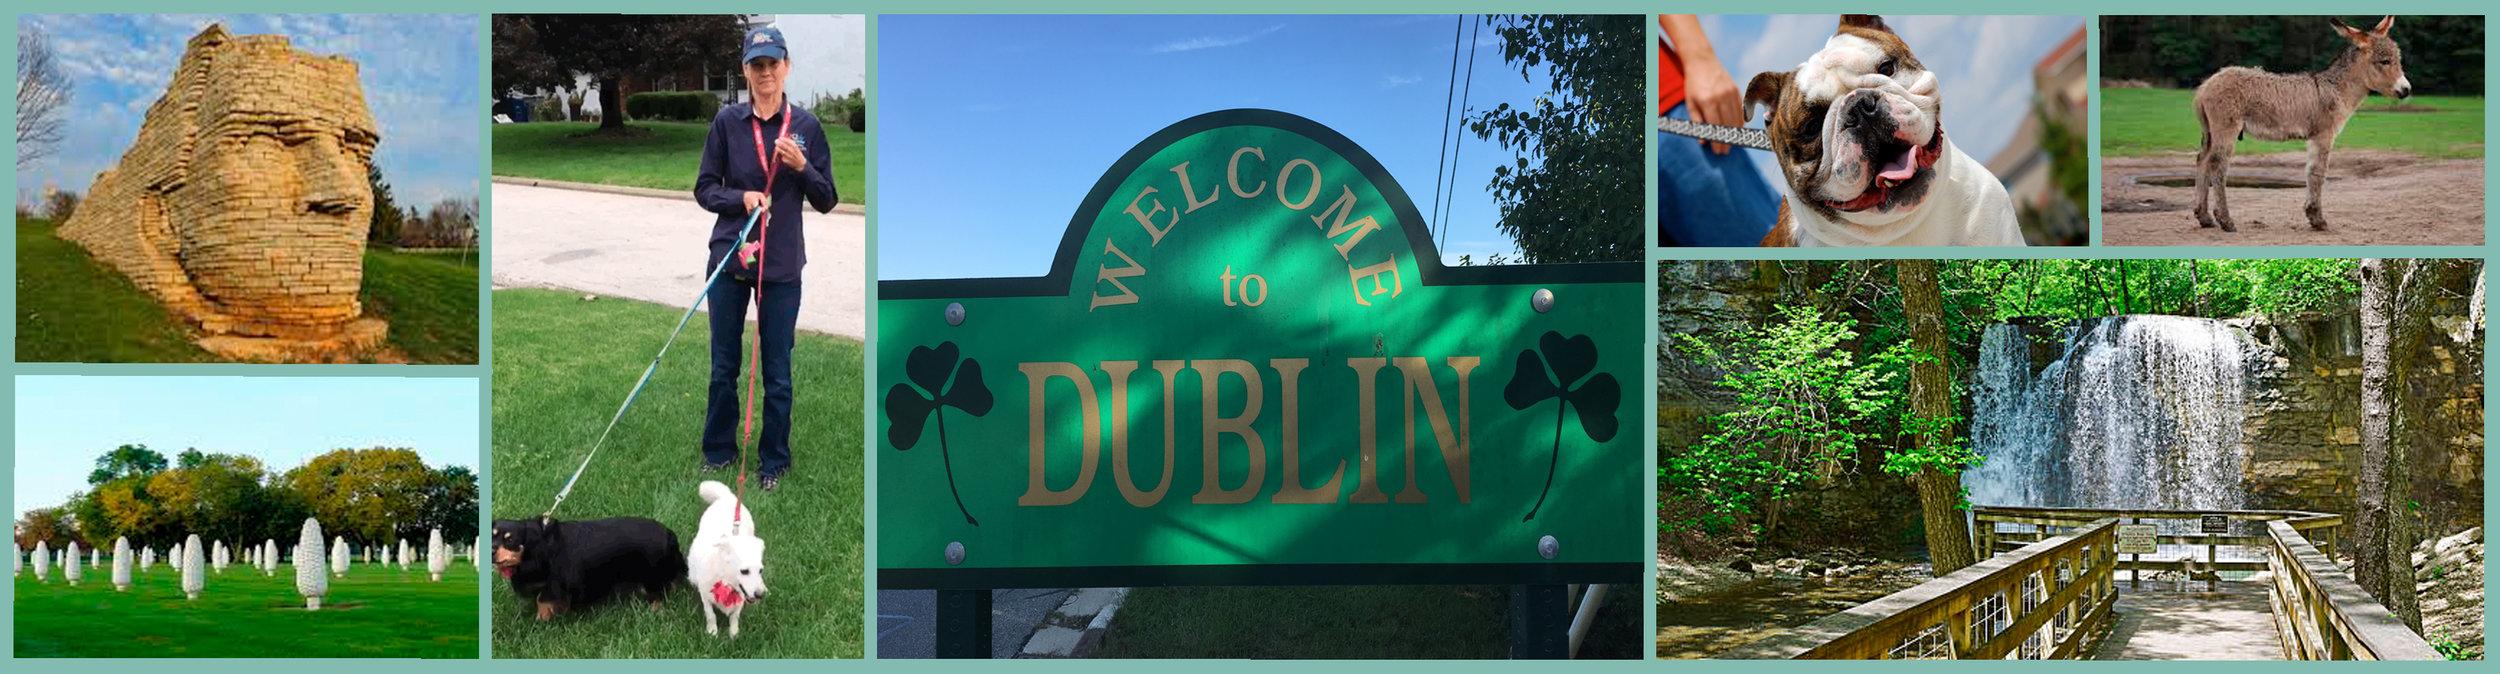 Pet sitting_Dublin_OH.jpg